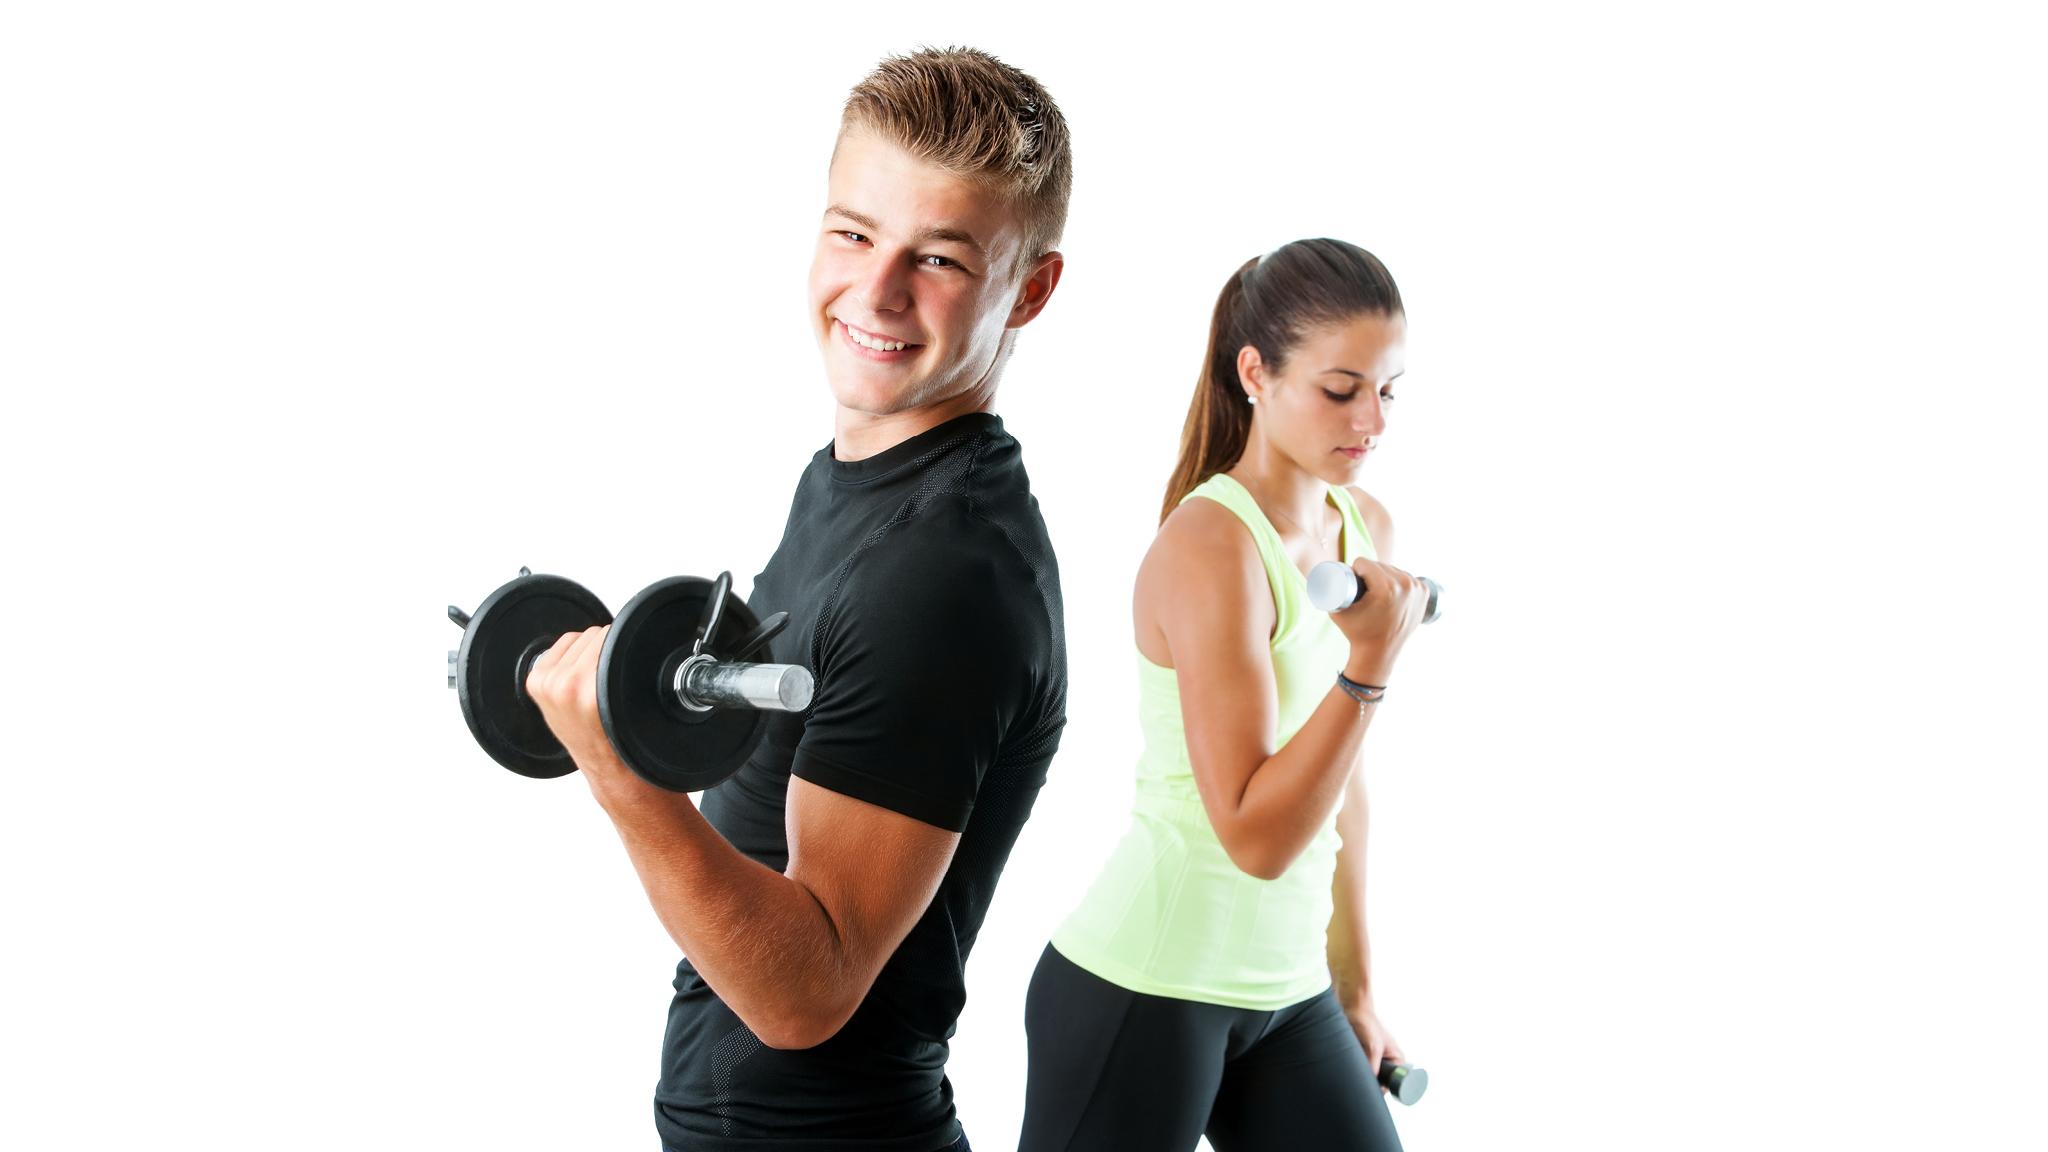 Dampak Workout Pada Badan Di Usia Remaja